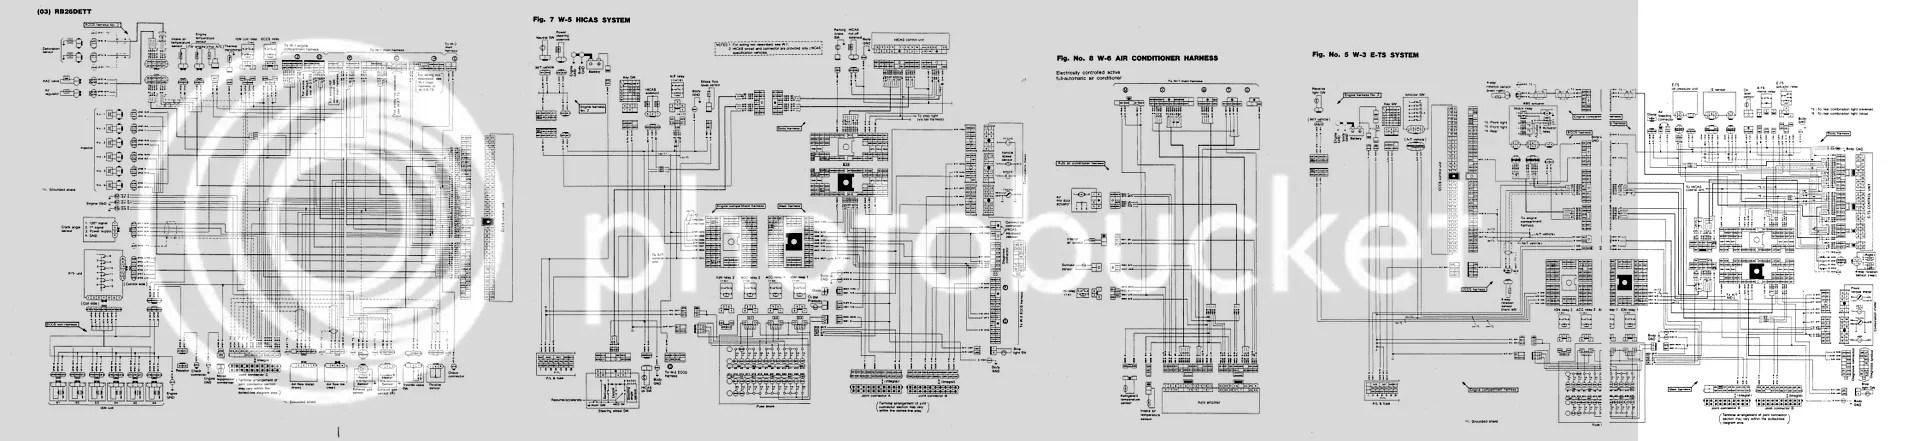 skyline r33 gtst wiring diagram create your own venn free r32 gtr/gts4 - gt-r register nissan and drivers club forum